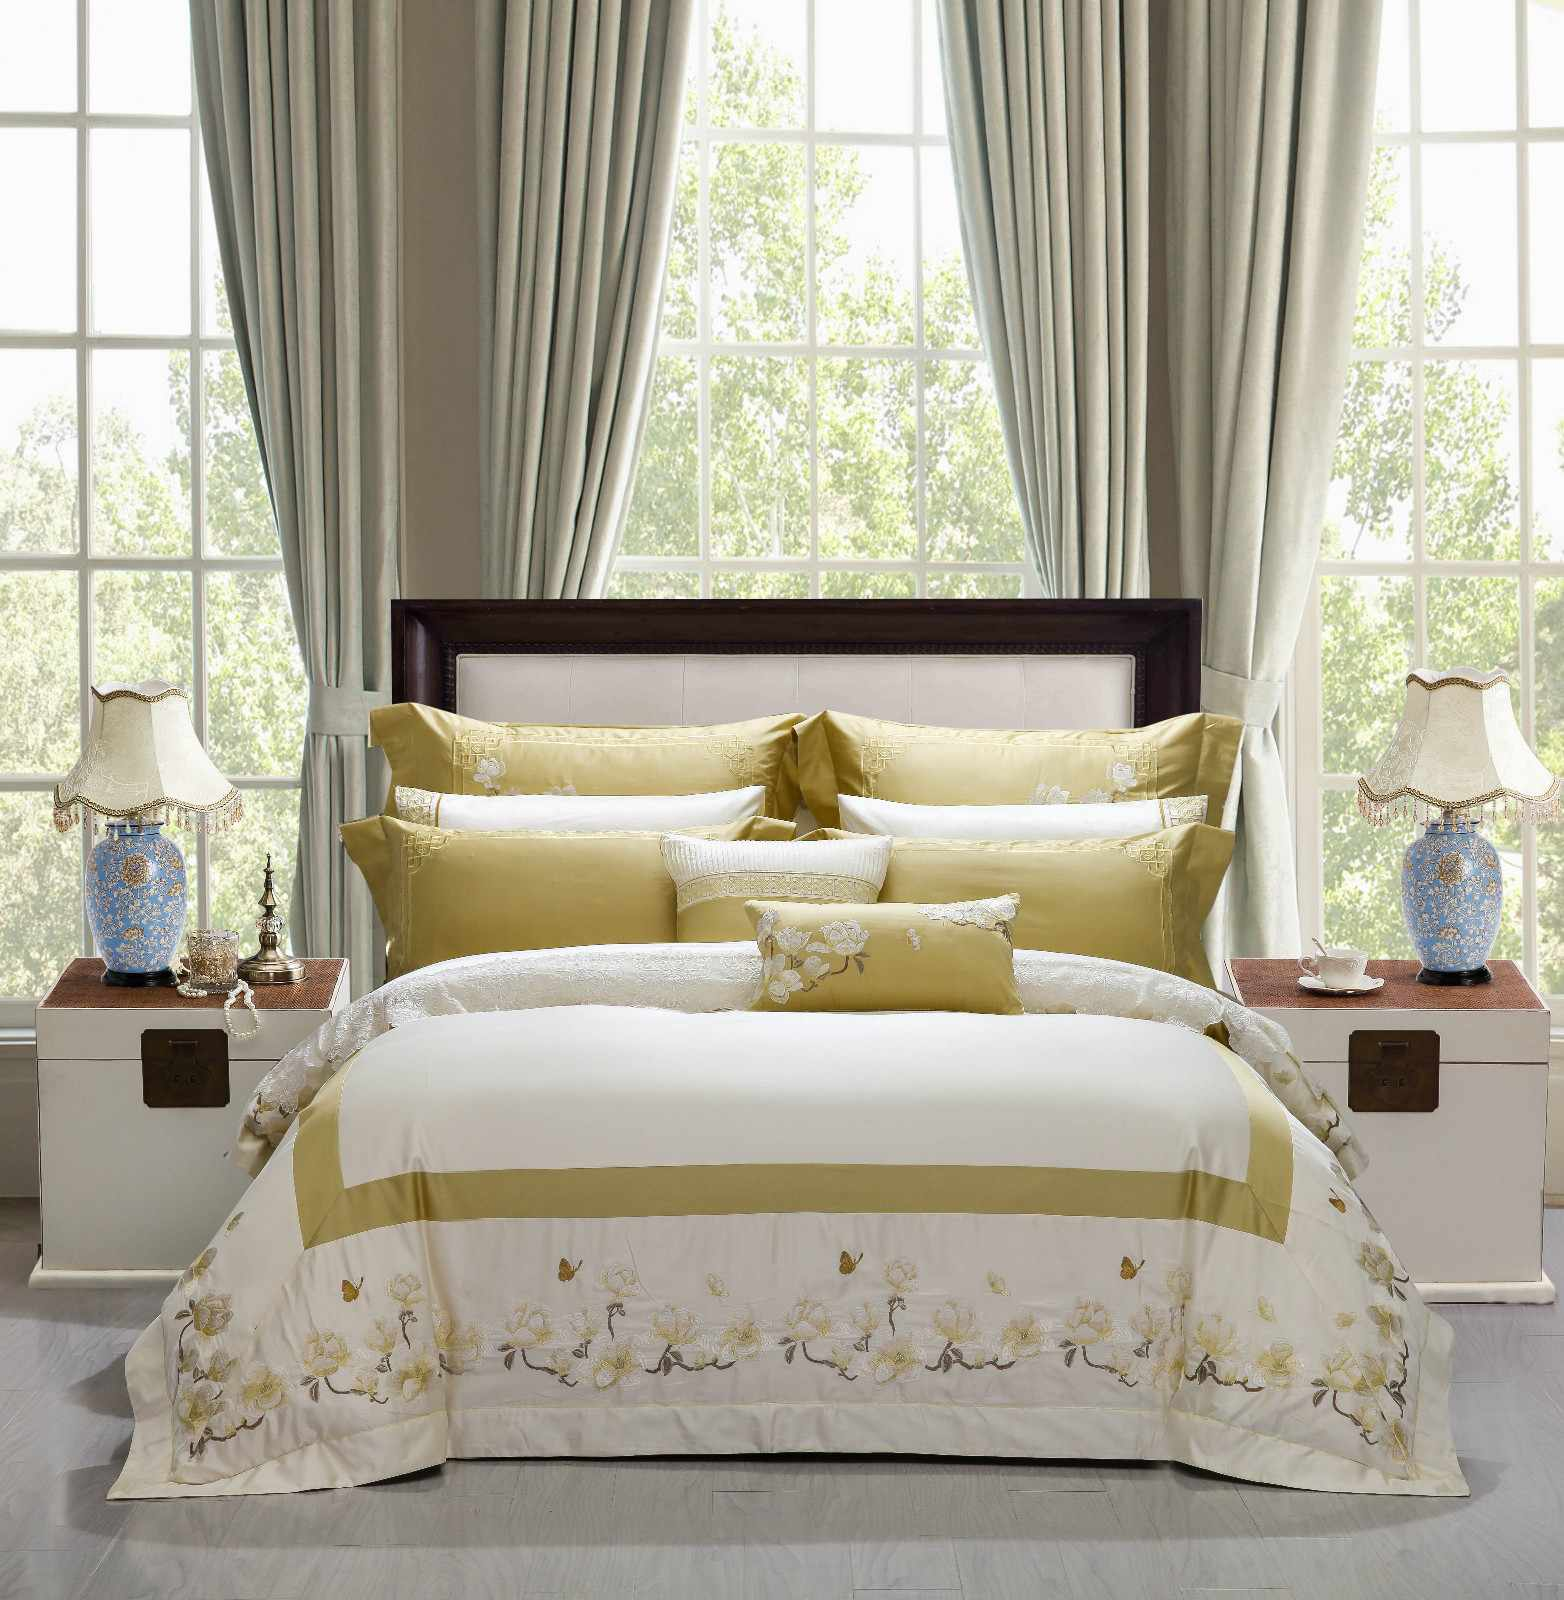 Daphne 100 cotton bedding sets brushed longstaple magnolia high